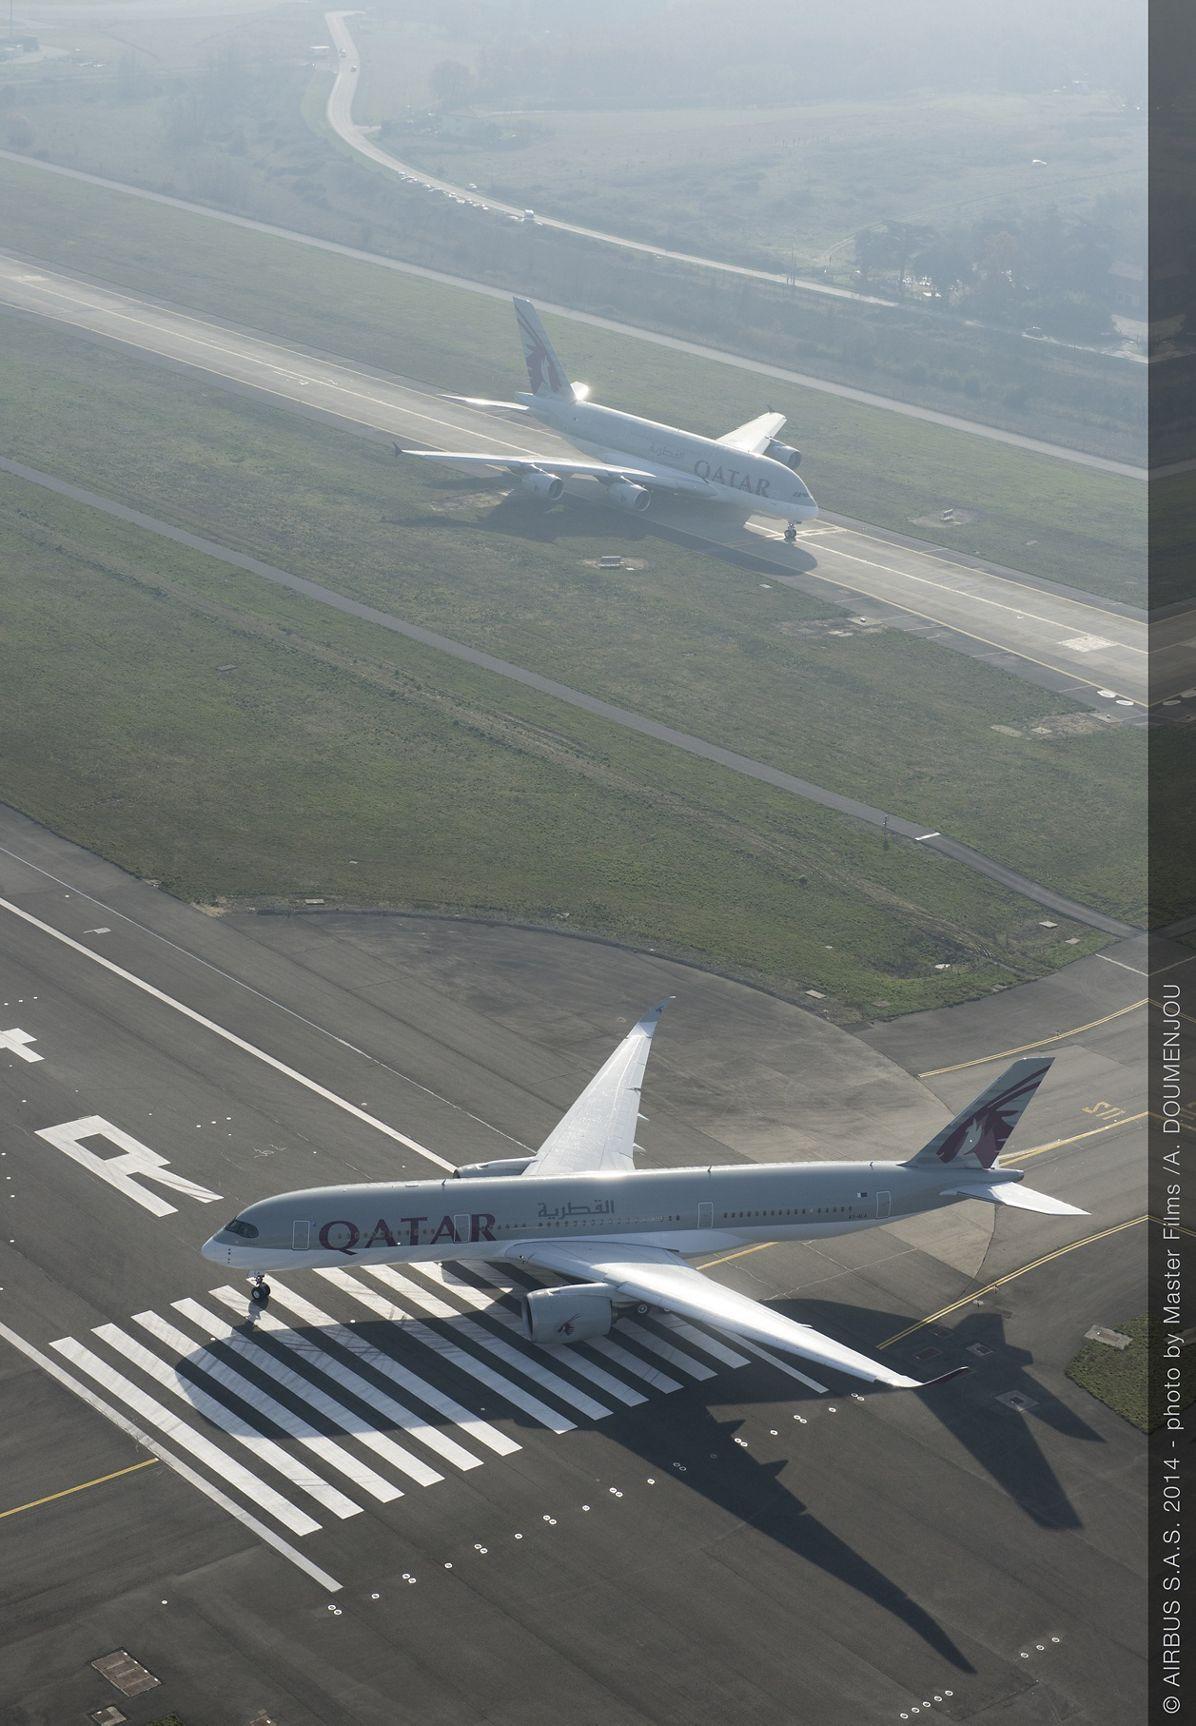 Qatar Airways A350 XWB and A380 taxiing_4